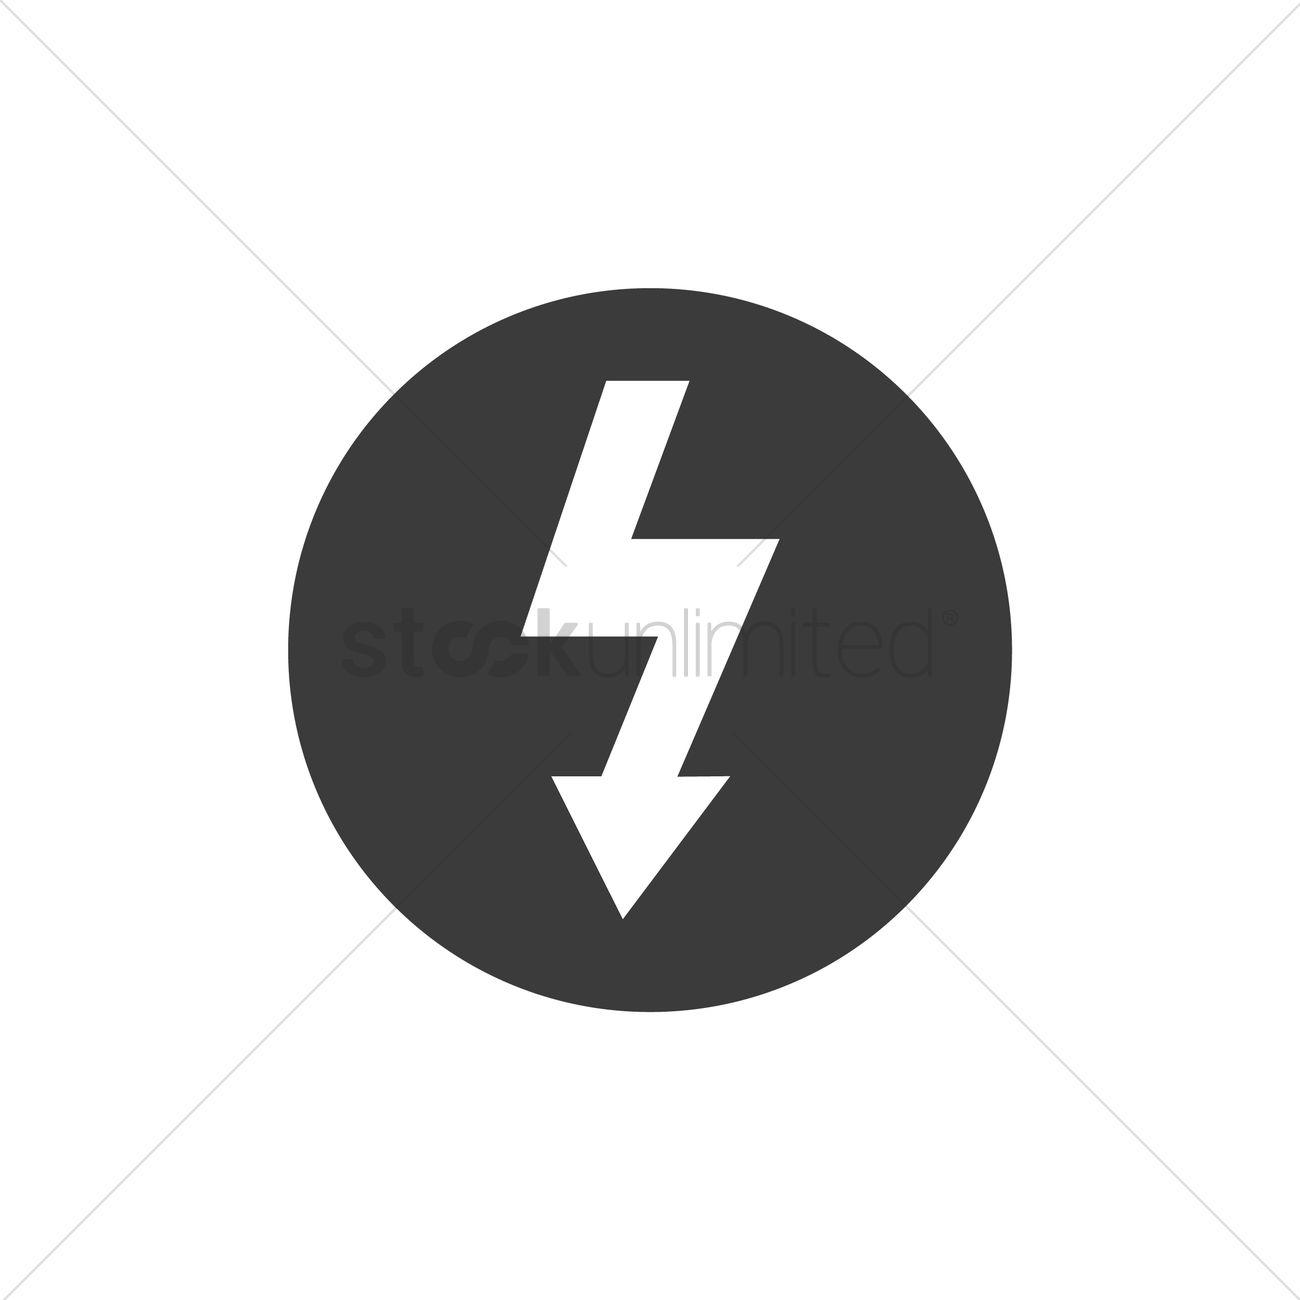 High Voltage Symbol Vector Image 2029520 Stockunlimited